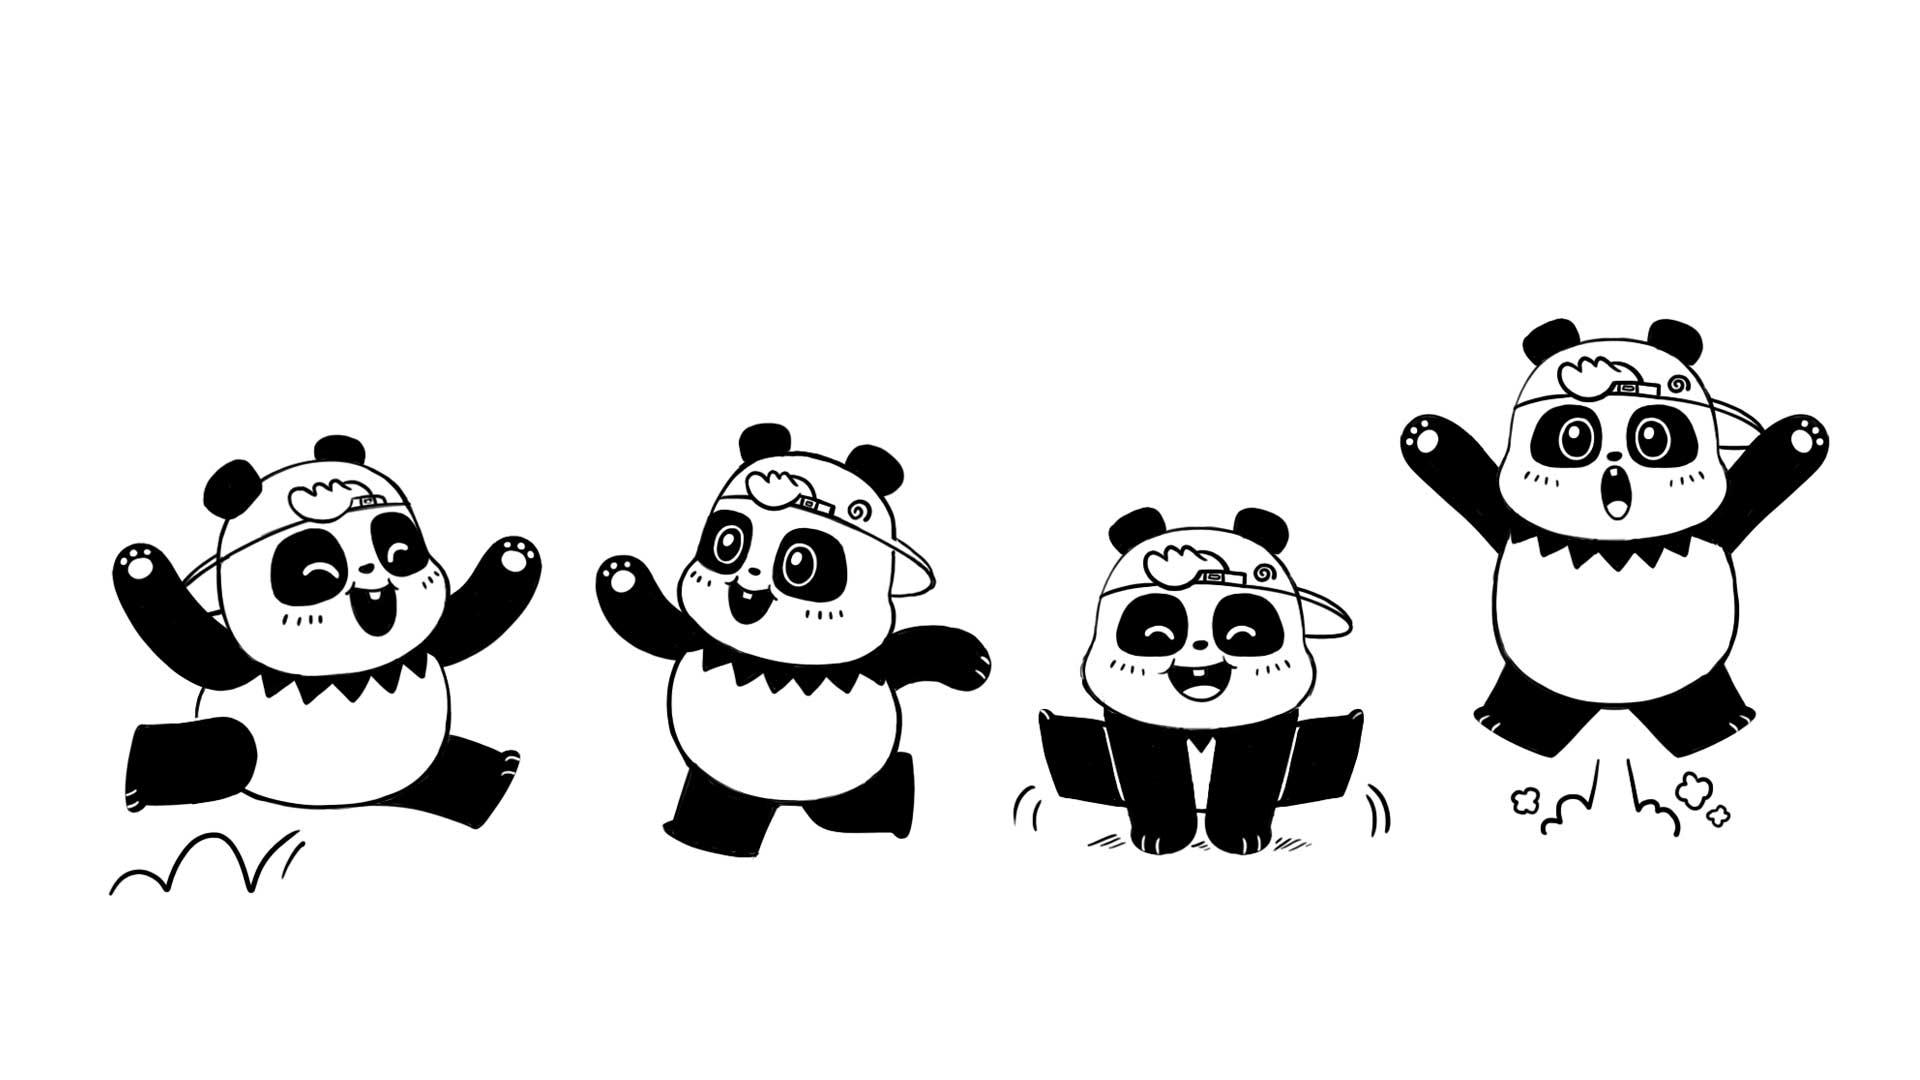 3D-Animation-PandaHouse-Hologram-5